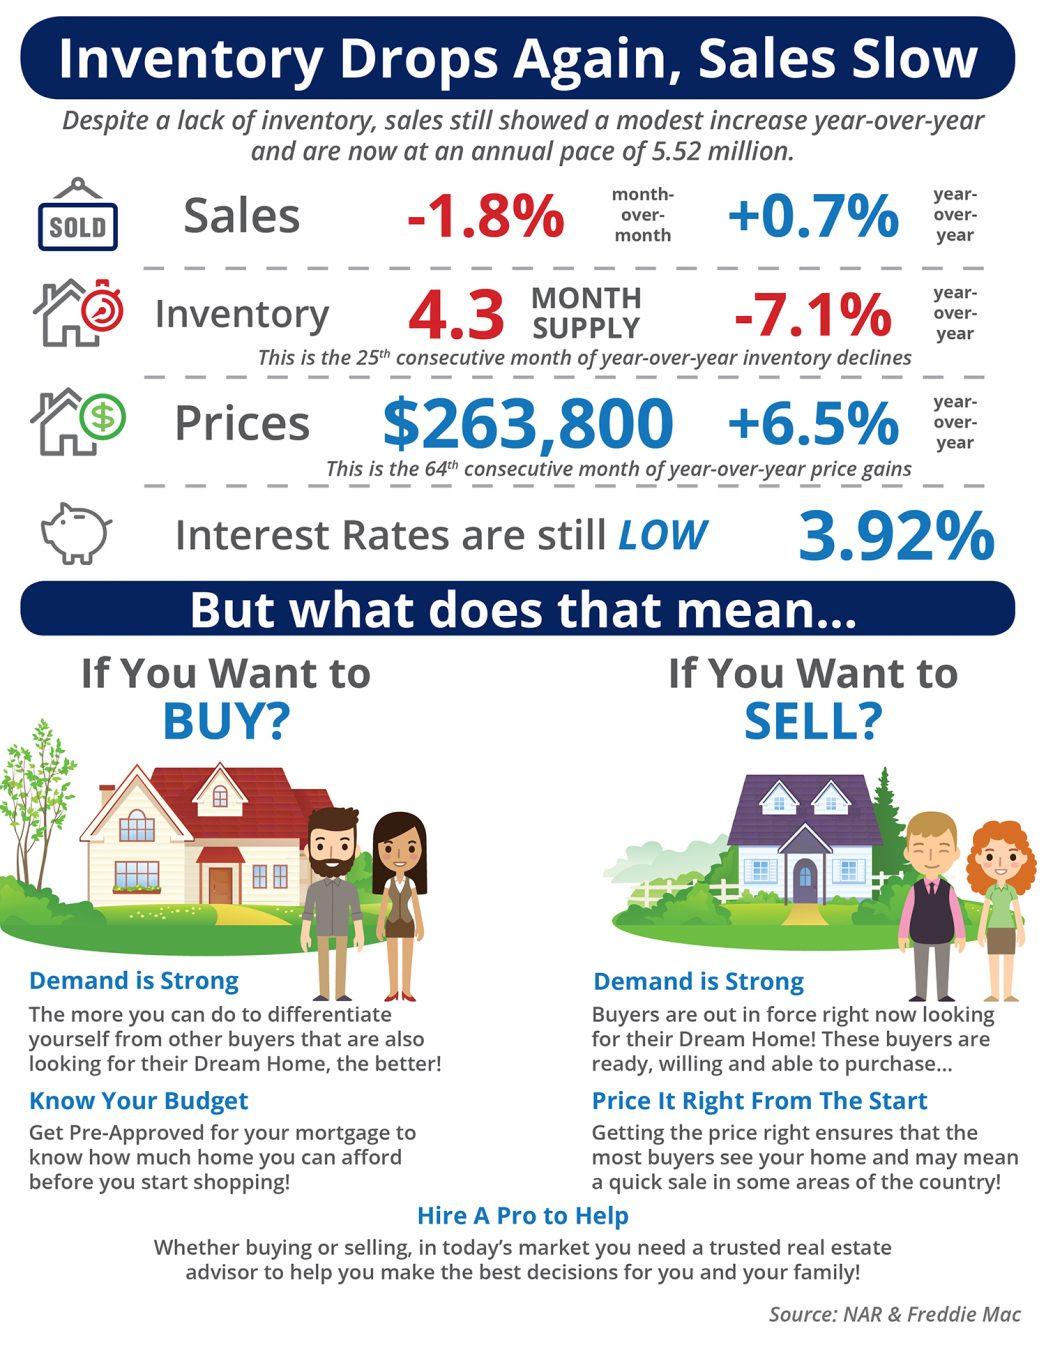 Scottsdale Real Estate Inventory